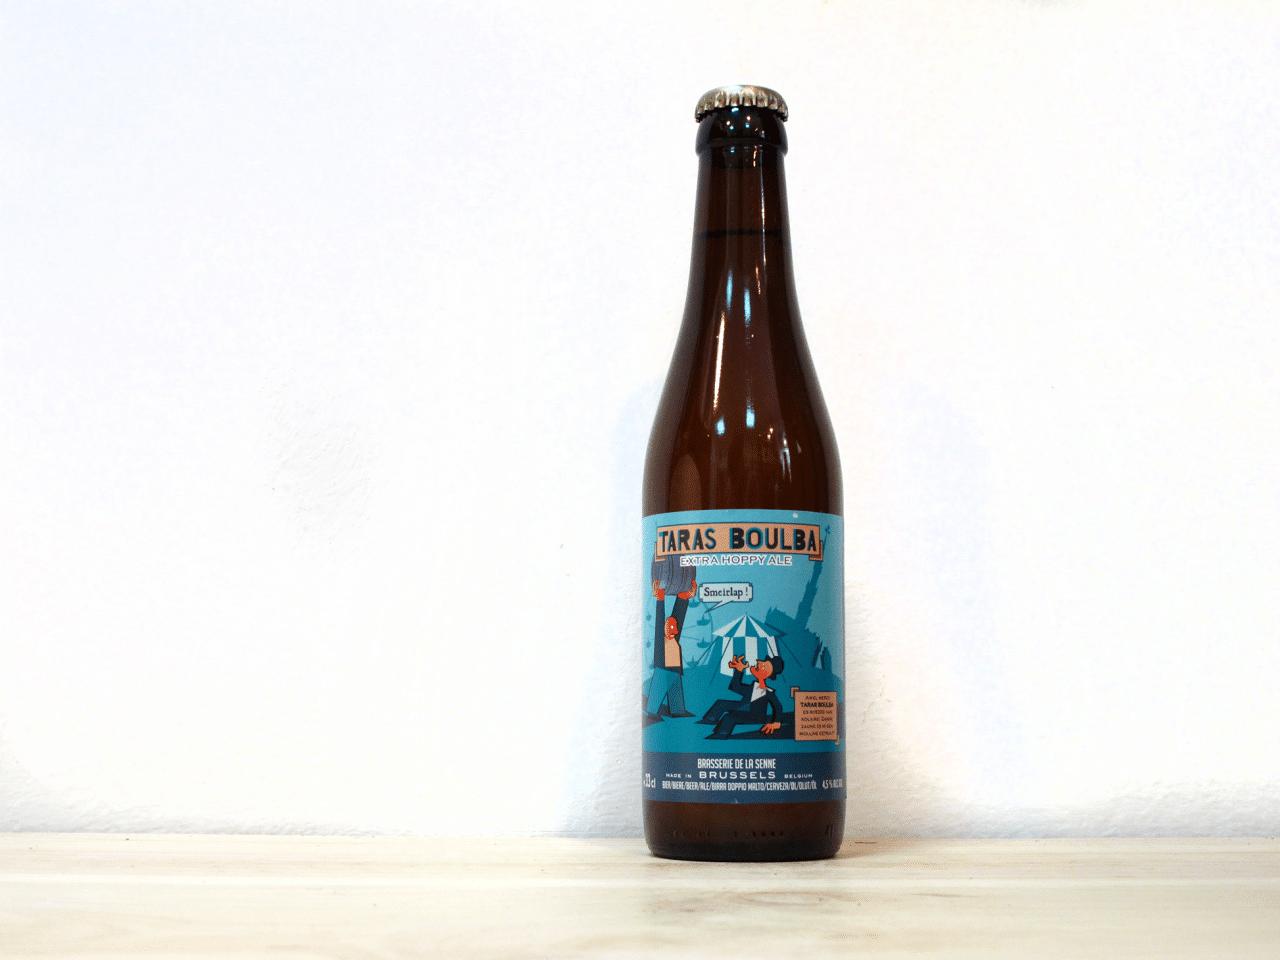 Botella de Cerveza belga Brasserie de la Senne Taras Boulba